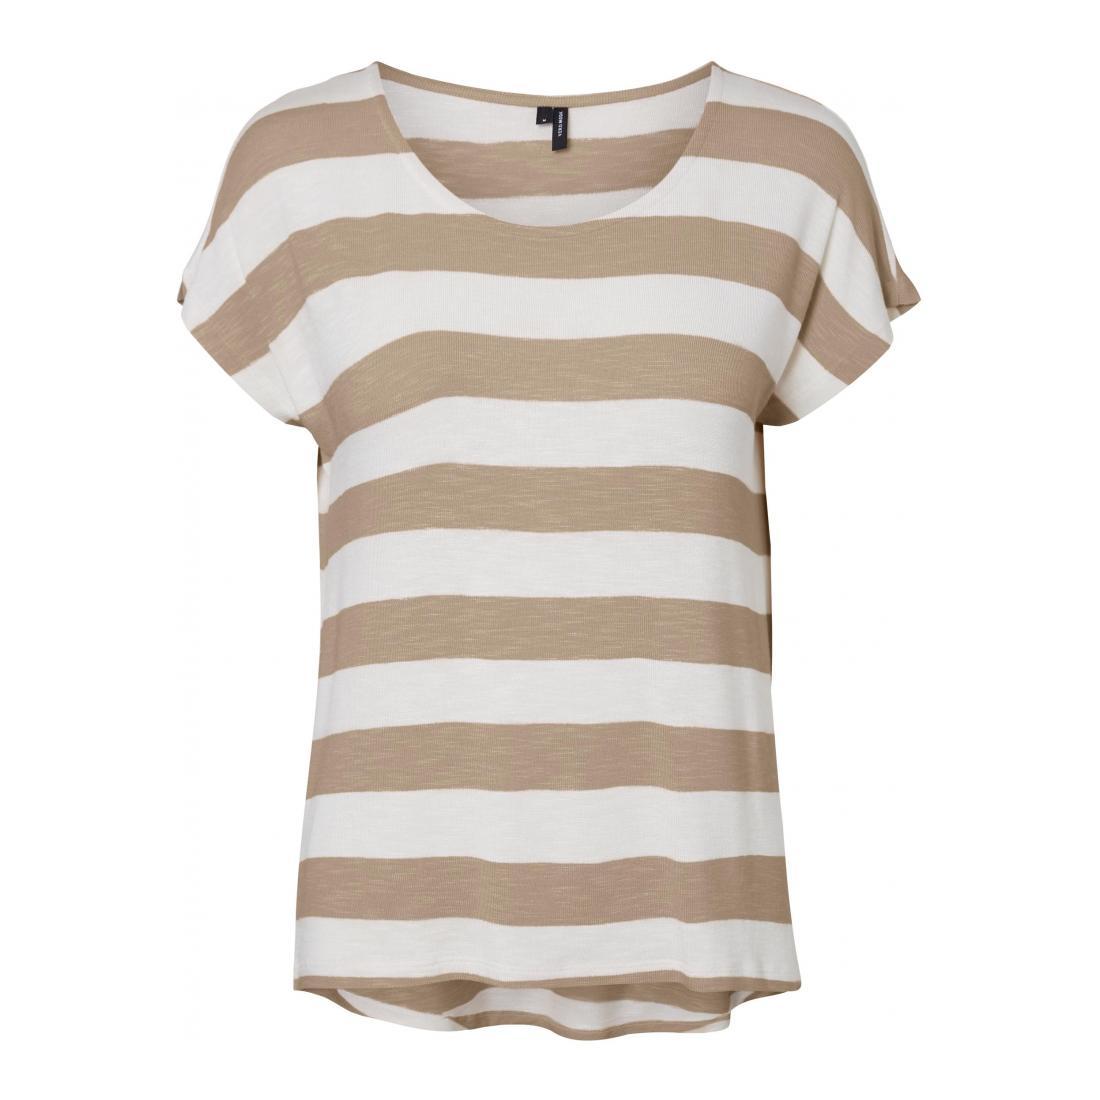 Vero Moda T-Shirt Damen VMWIDE STRIPE S/L TOP GA